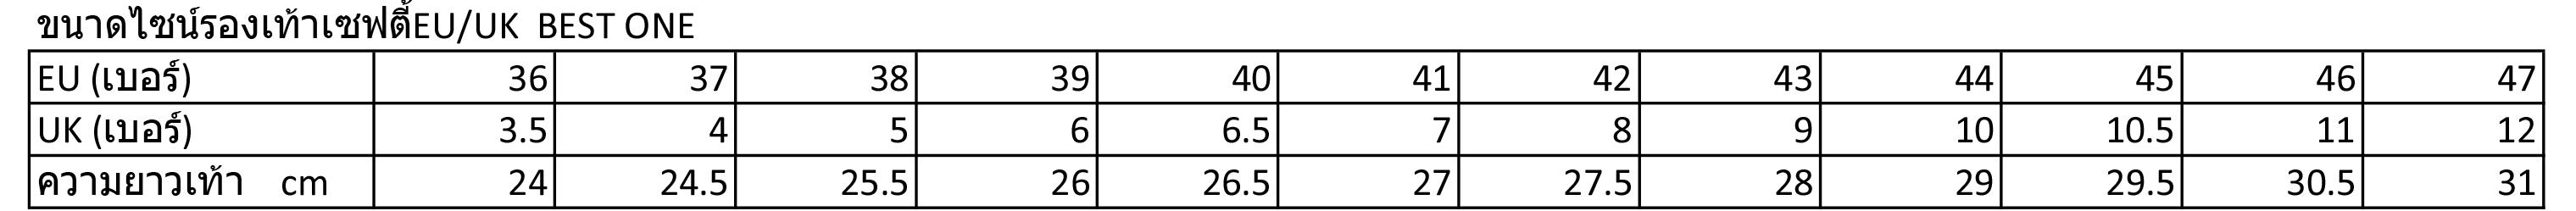 %e0%b8%95%e0%b8%b2%e0%b8%a3%e0%b8%b2%e0%b8%87%e0%b9%84%e0%b8%8b%e0%b8%99%e0%b9%8c%e0%b8%a3%e0%b8%ad%e0%b8%87%e0%b9%80%e0%b8%97%e0%b9%89%e0%b8%b2best-one